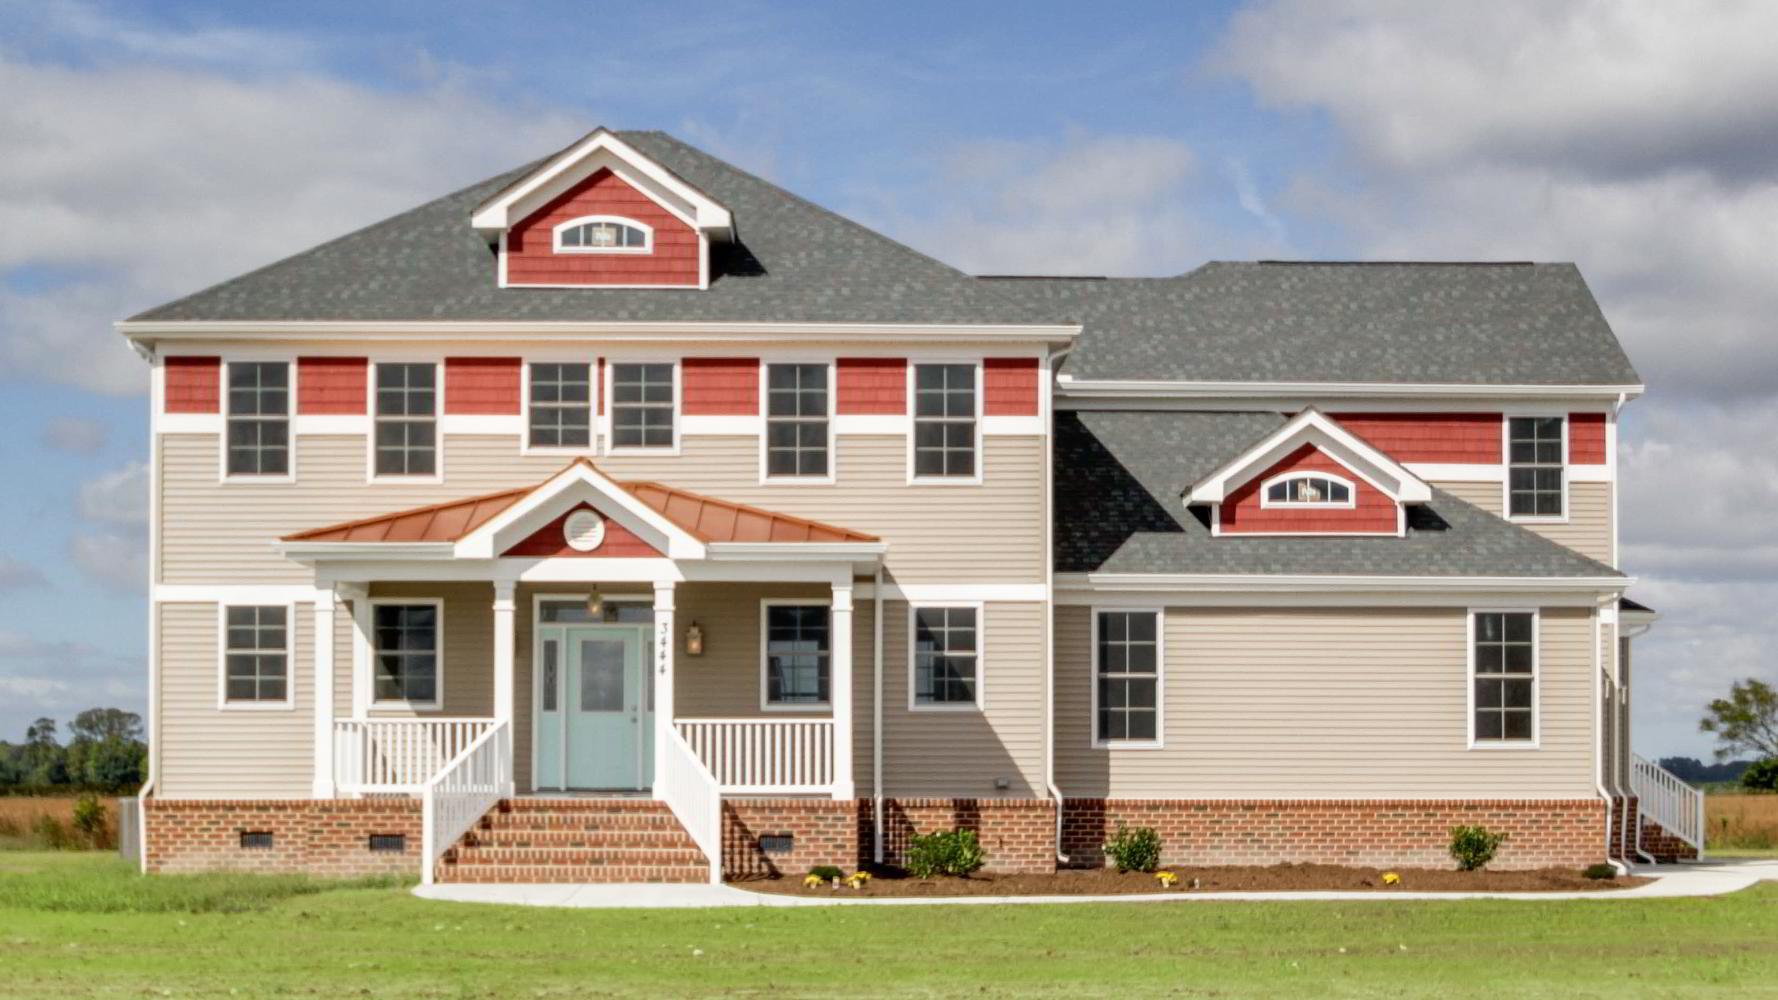 Virginia Beach model home built by Duane Cotton